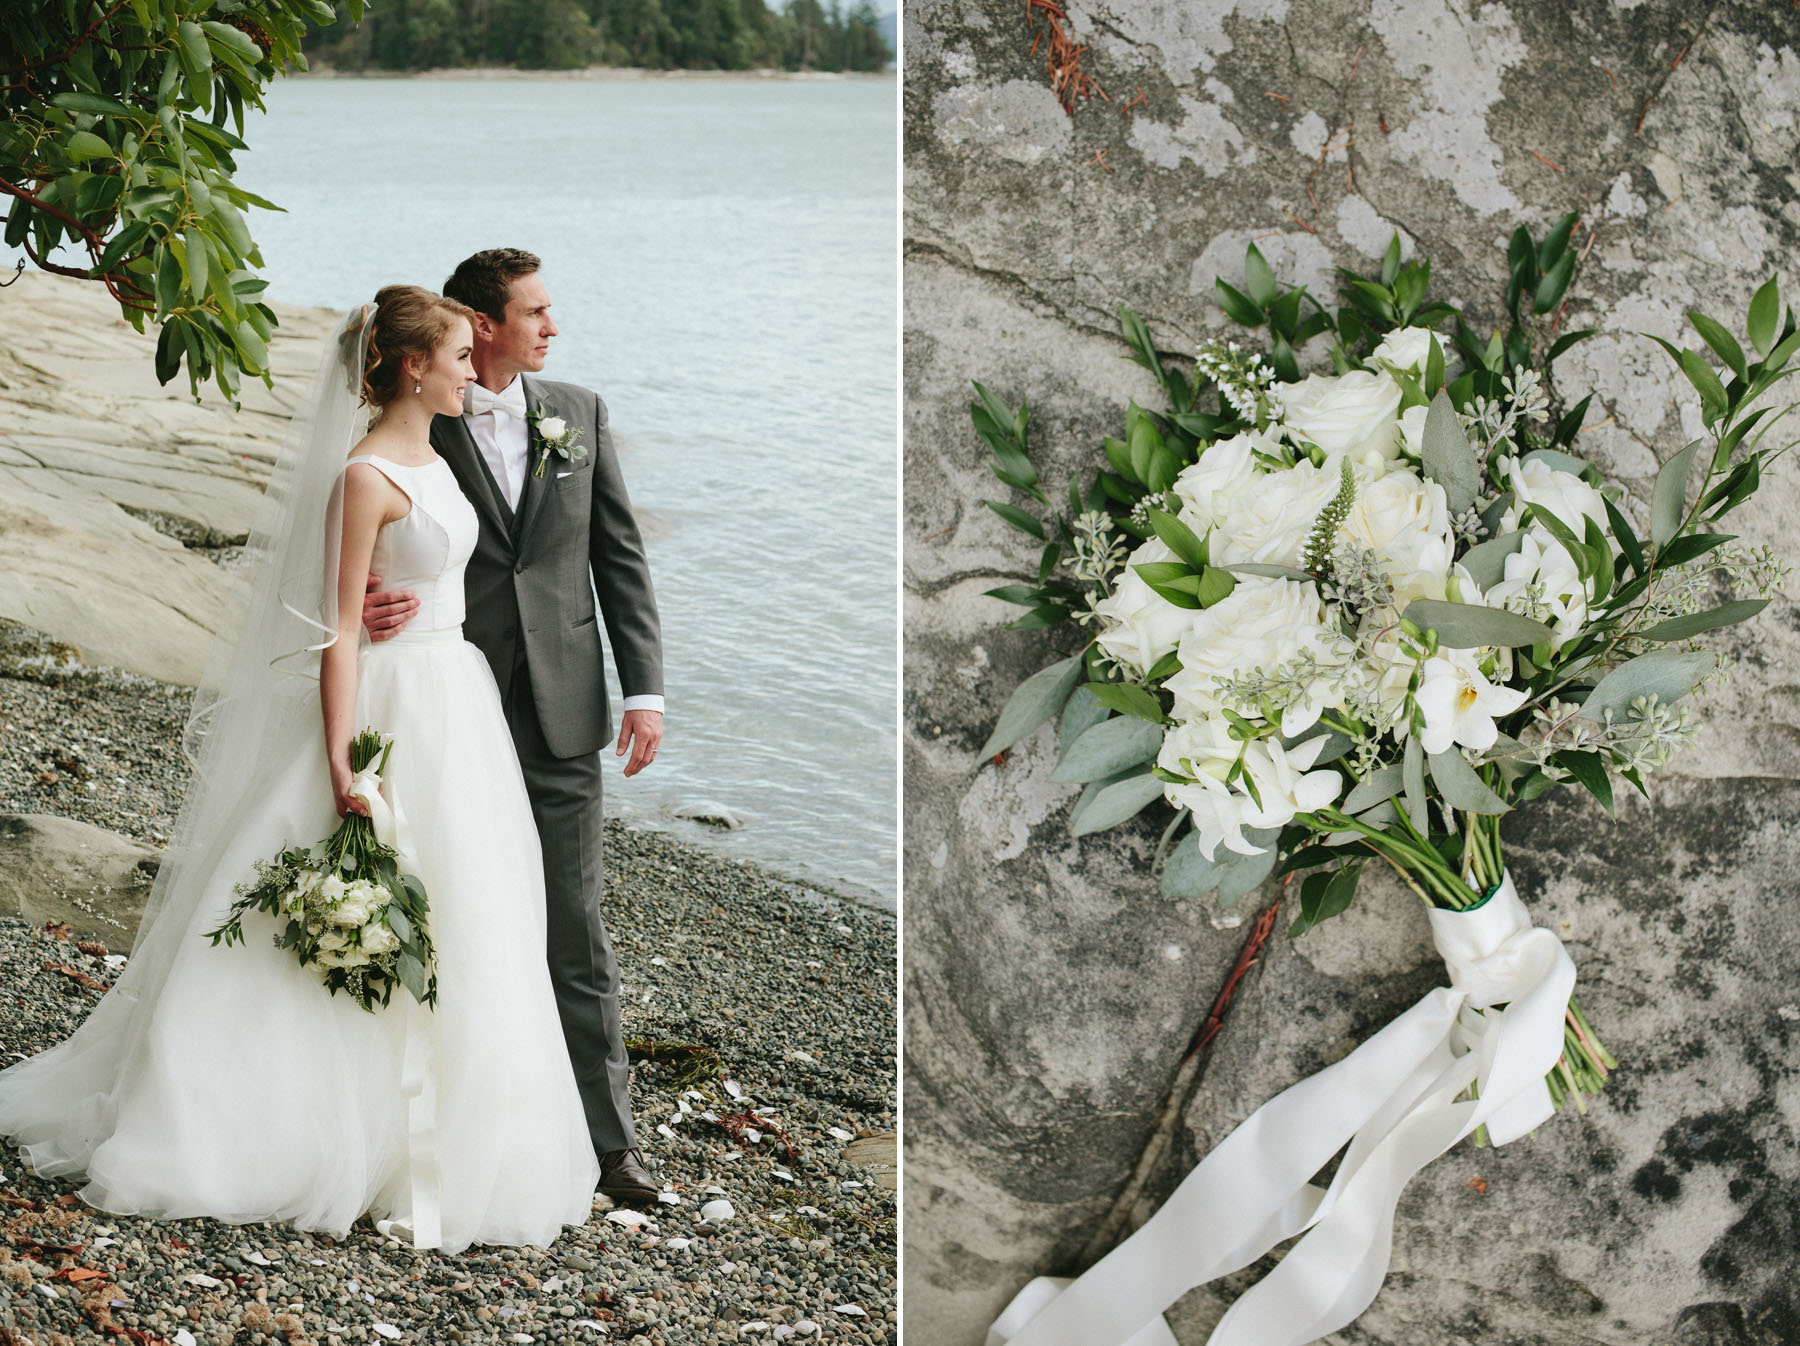 thetis-island-wedding-photographer-rp-rn-116.jpg